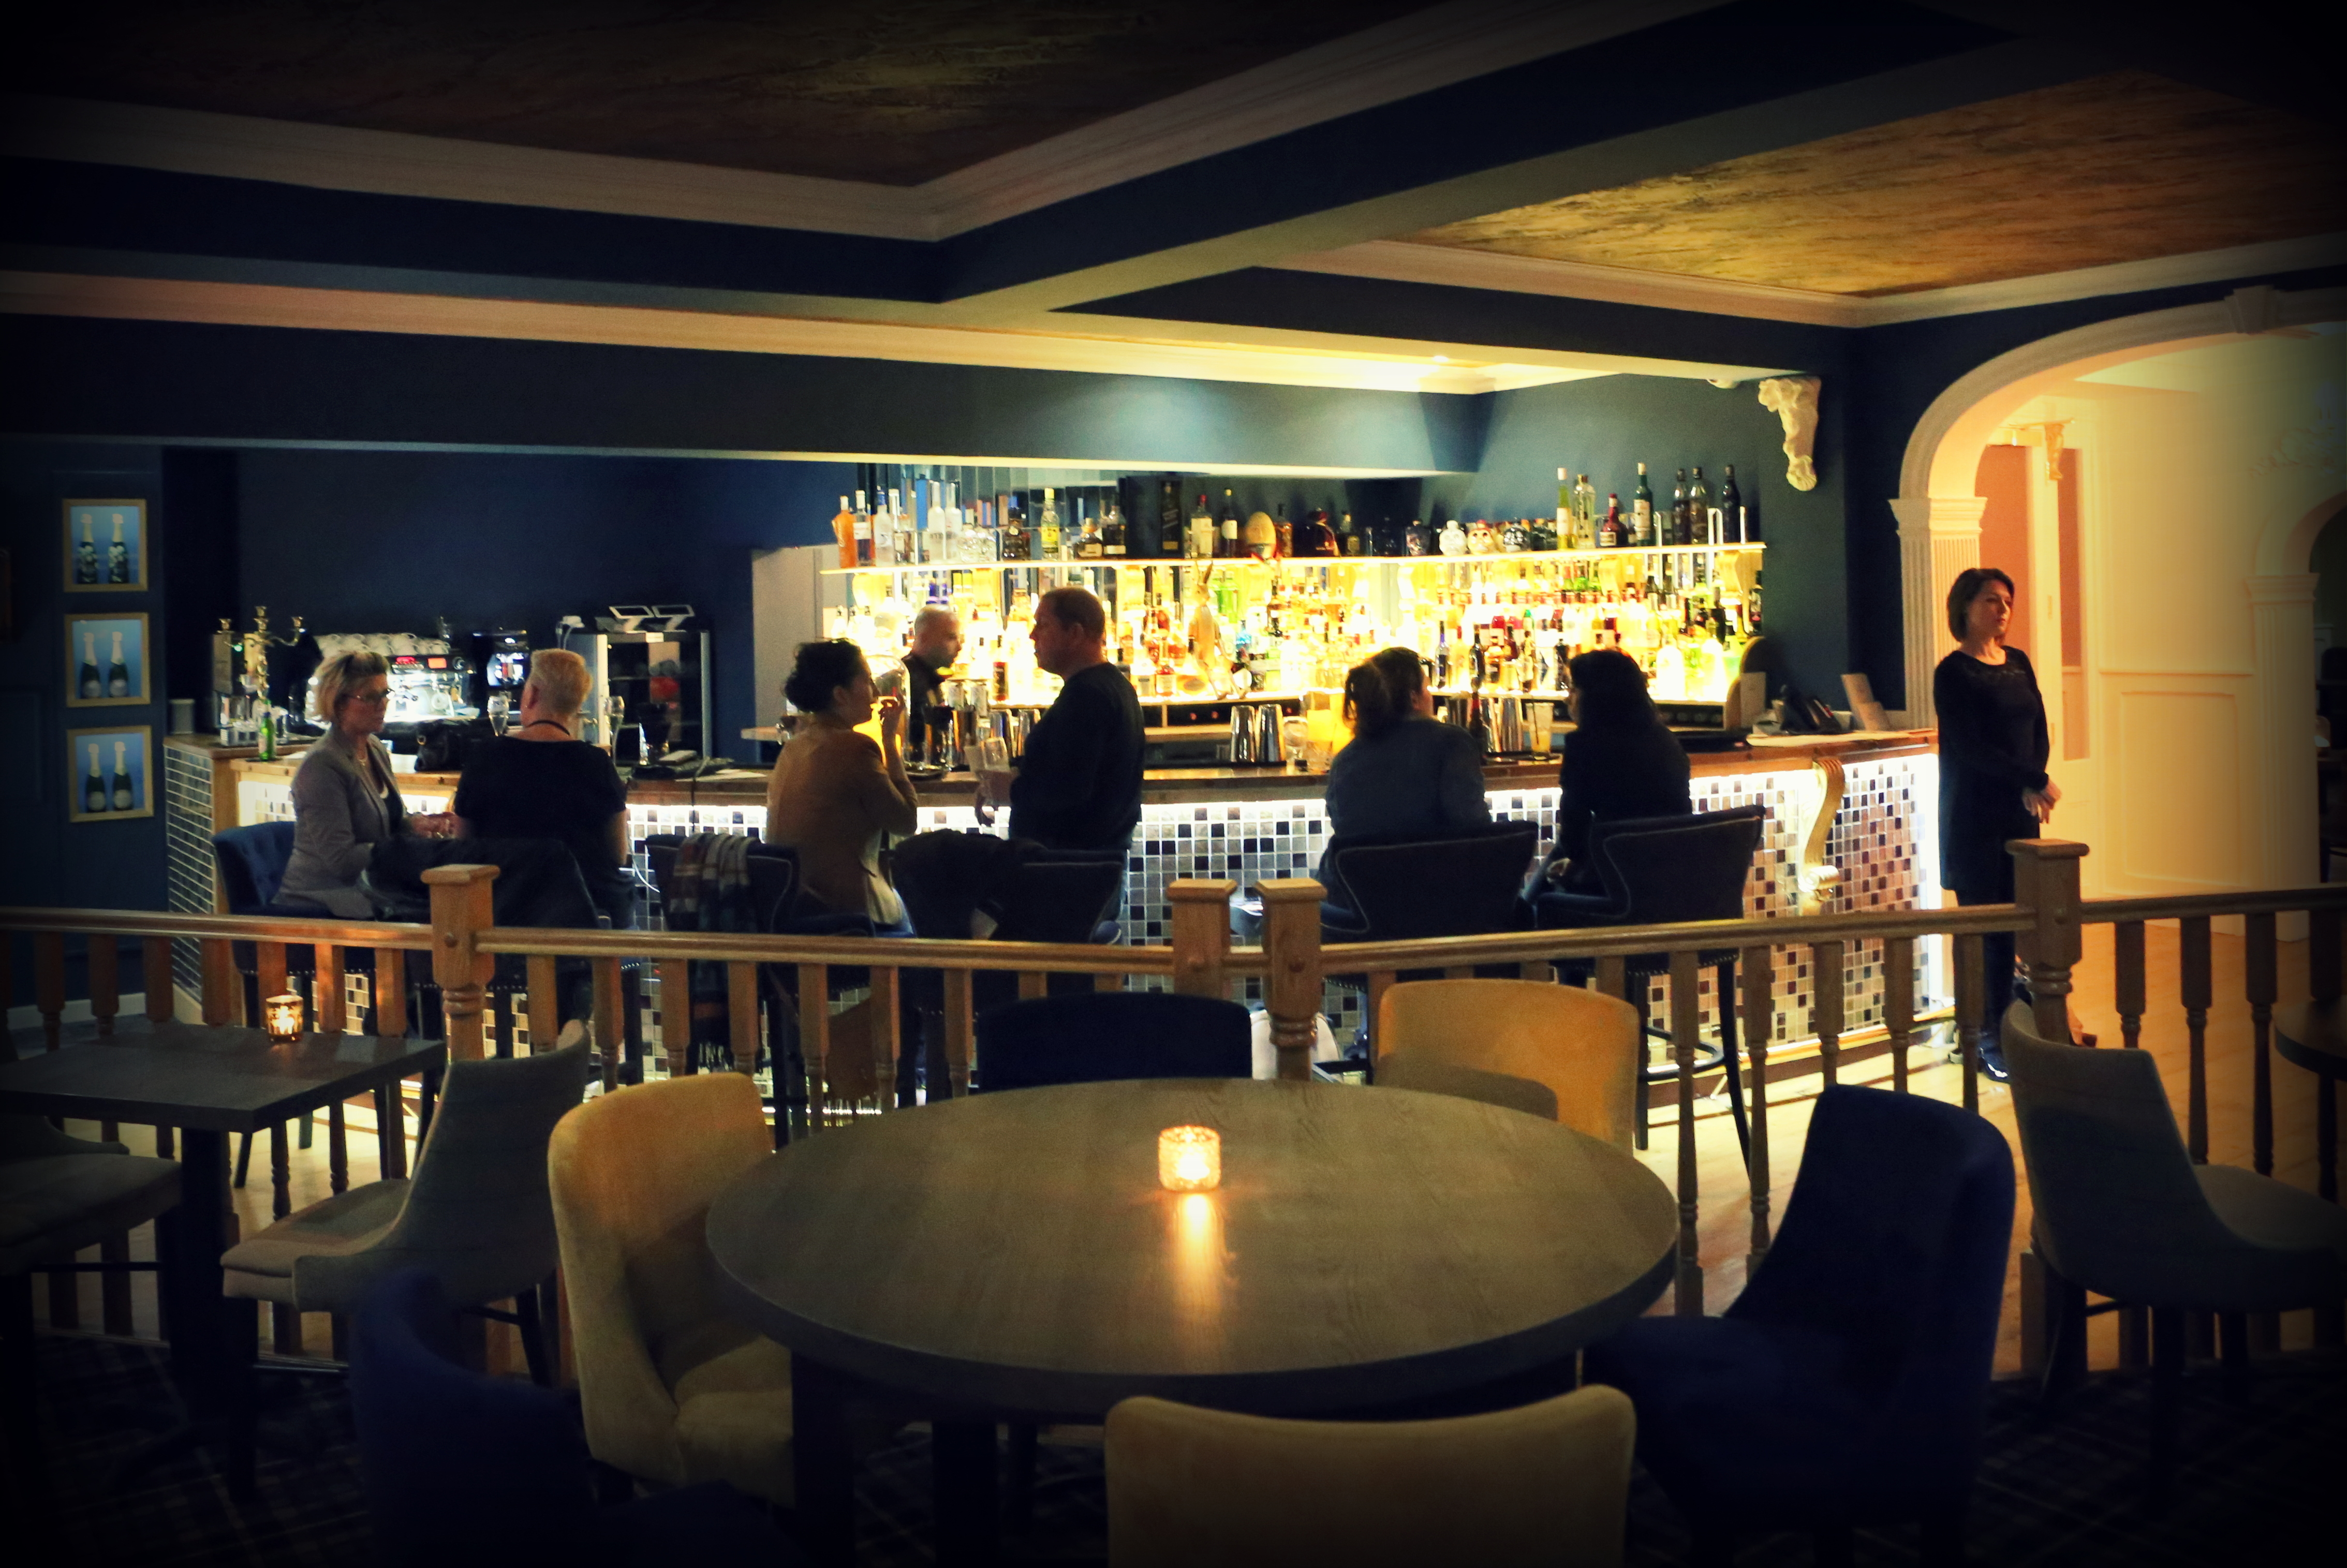 Royal Hotel Cocktail Bar